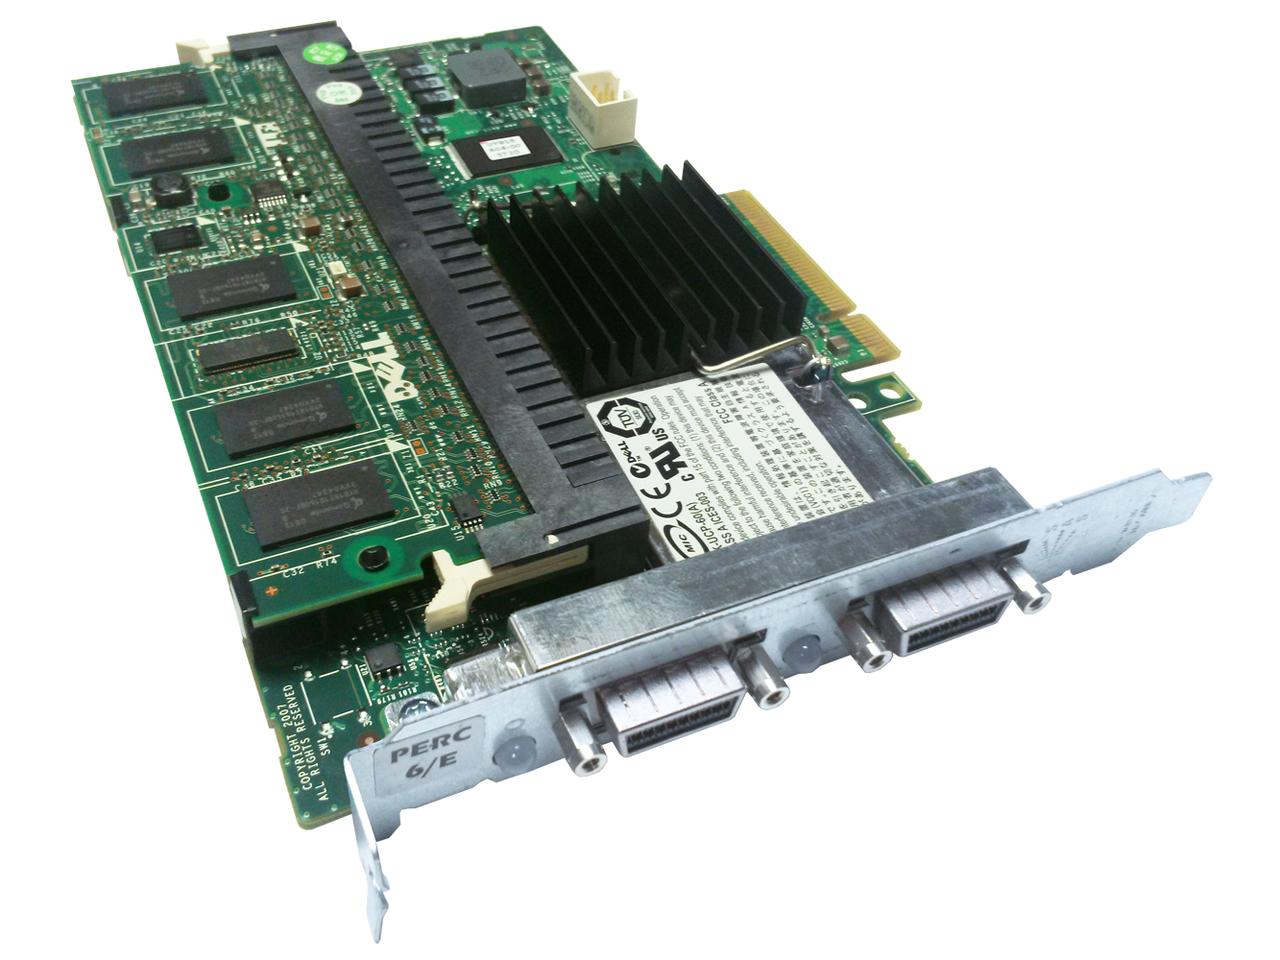 DELL PERC 6/E PCI-E 512MB BBU SAS/SATA RAID CONTROLLER (0M623J)